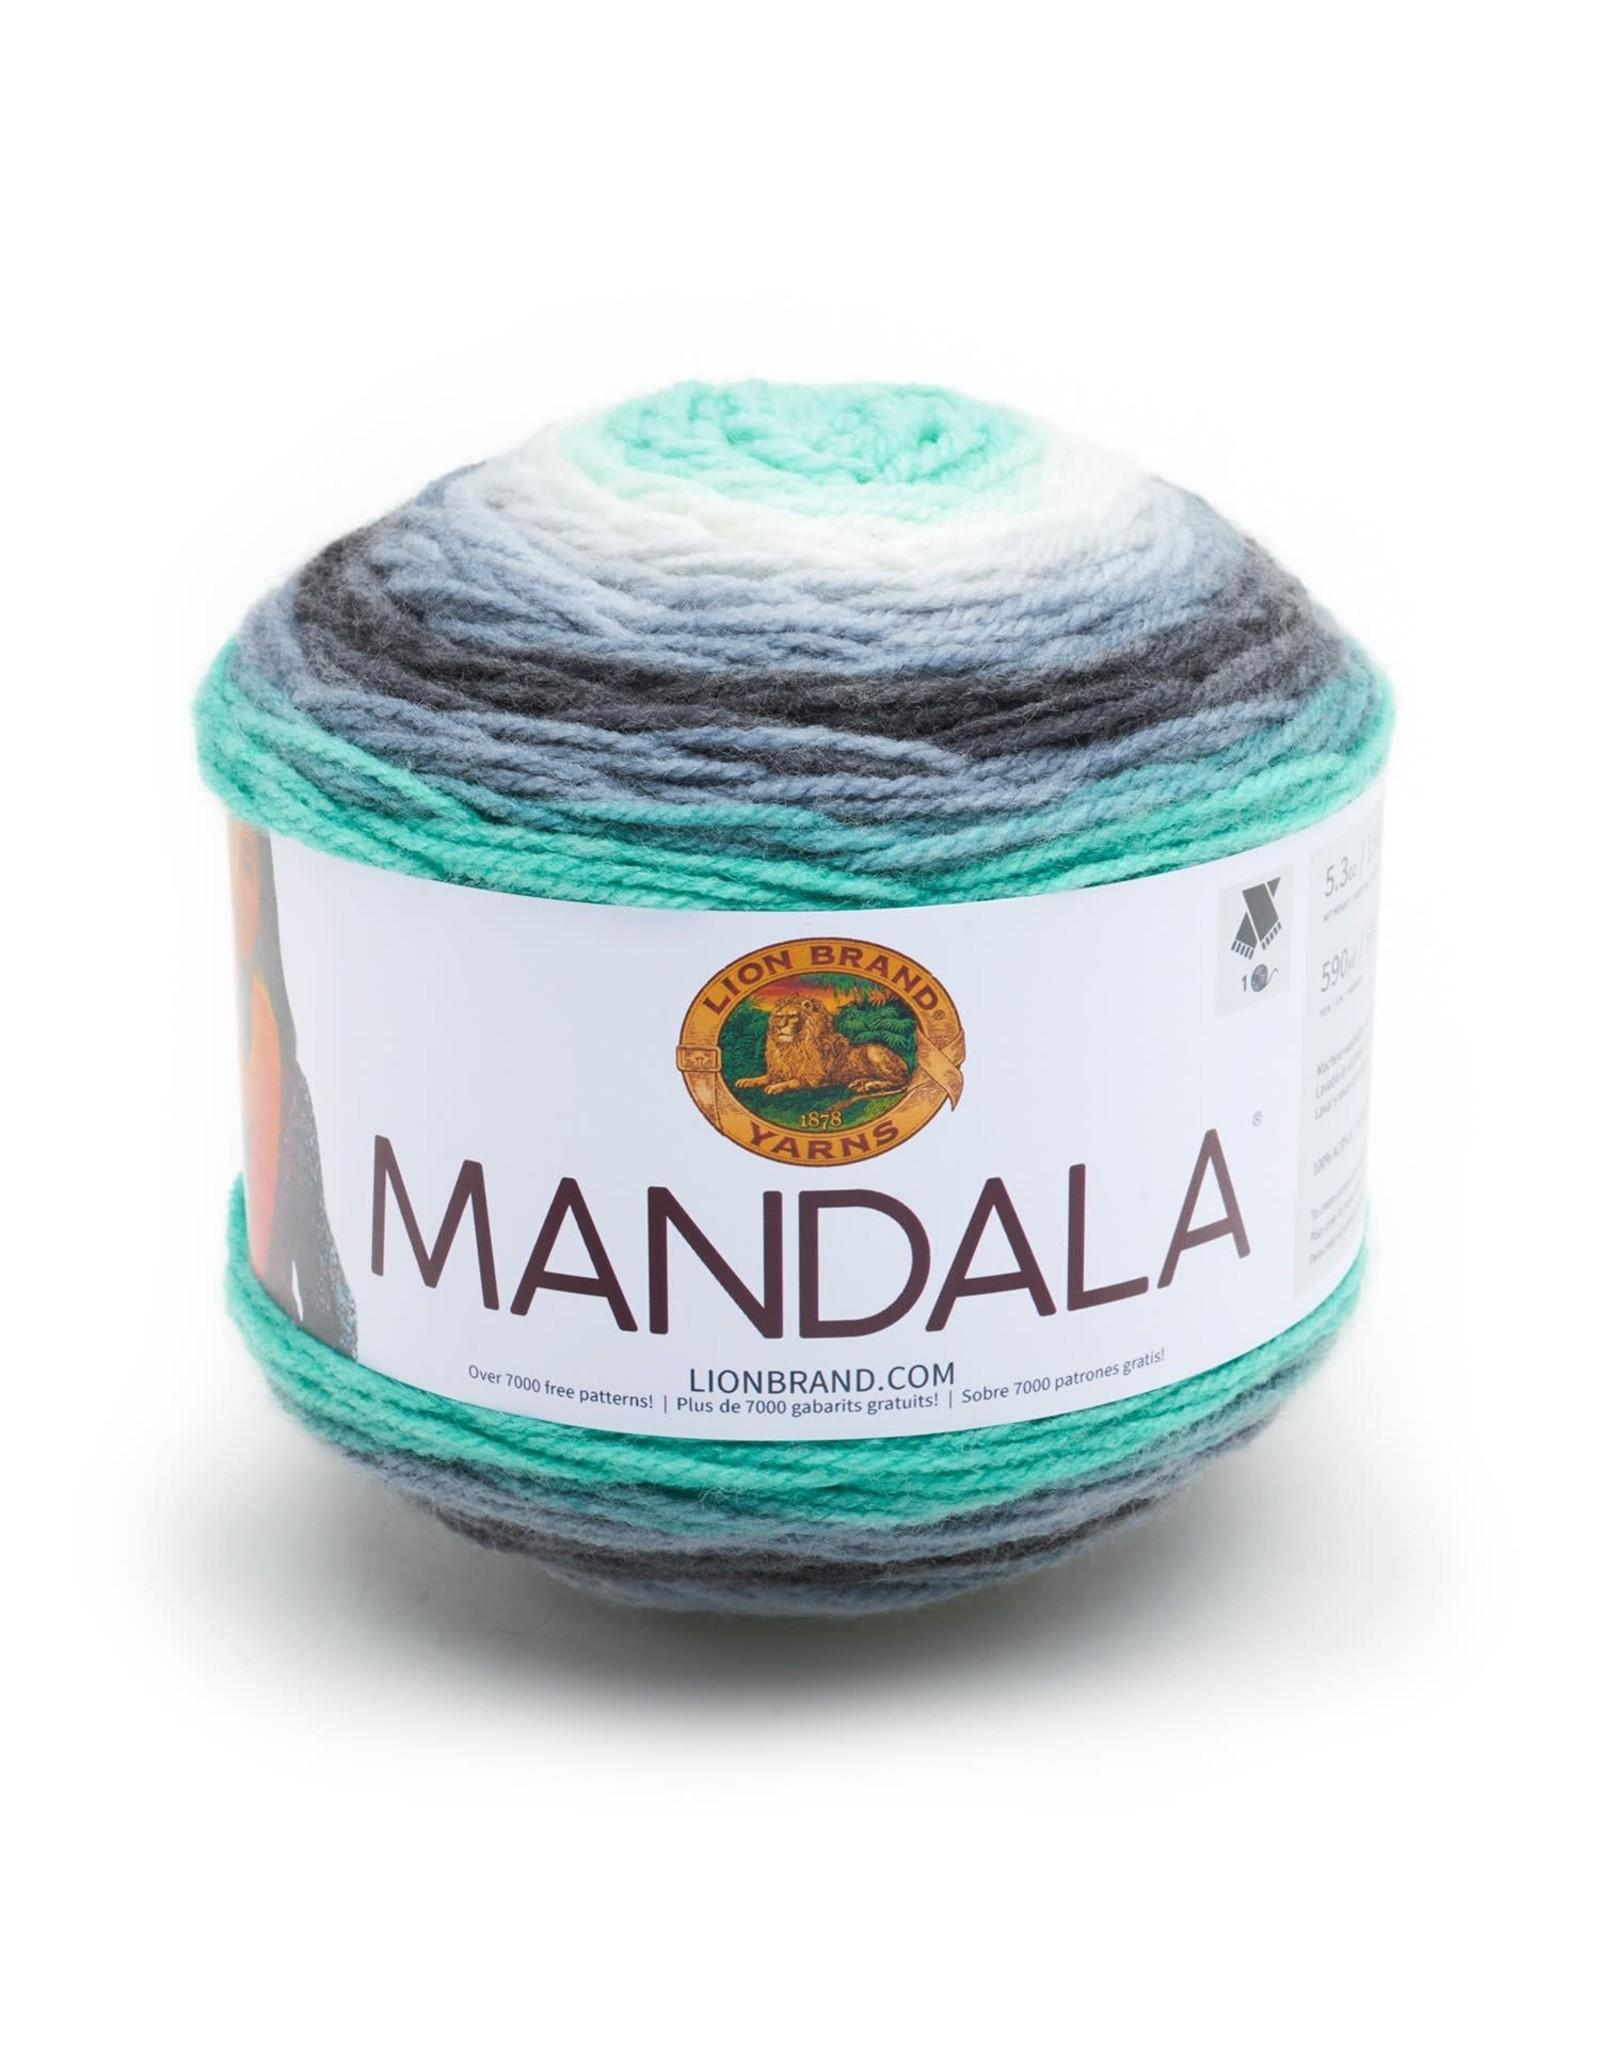 Genie - Mandala - Lion Brand